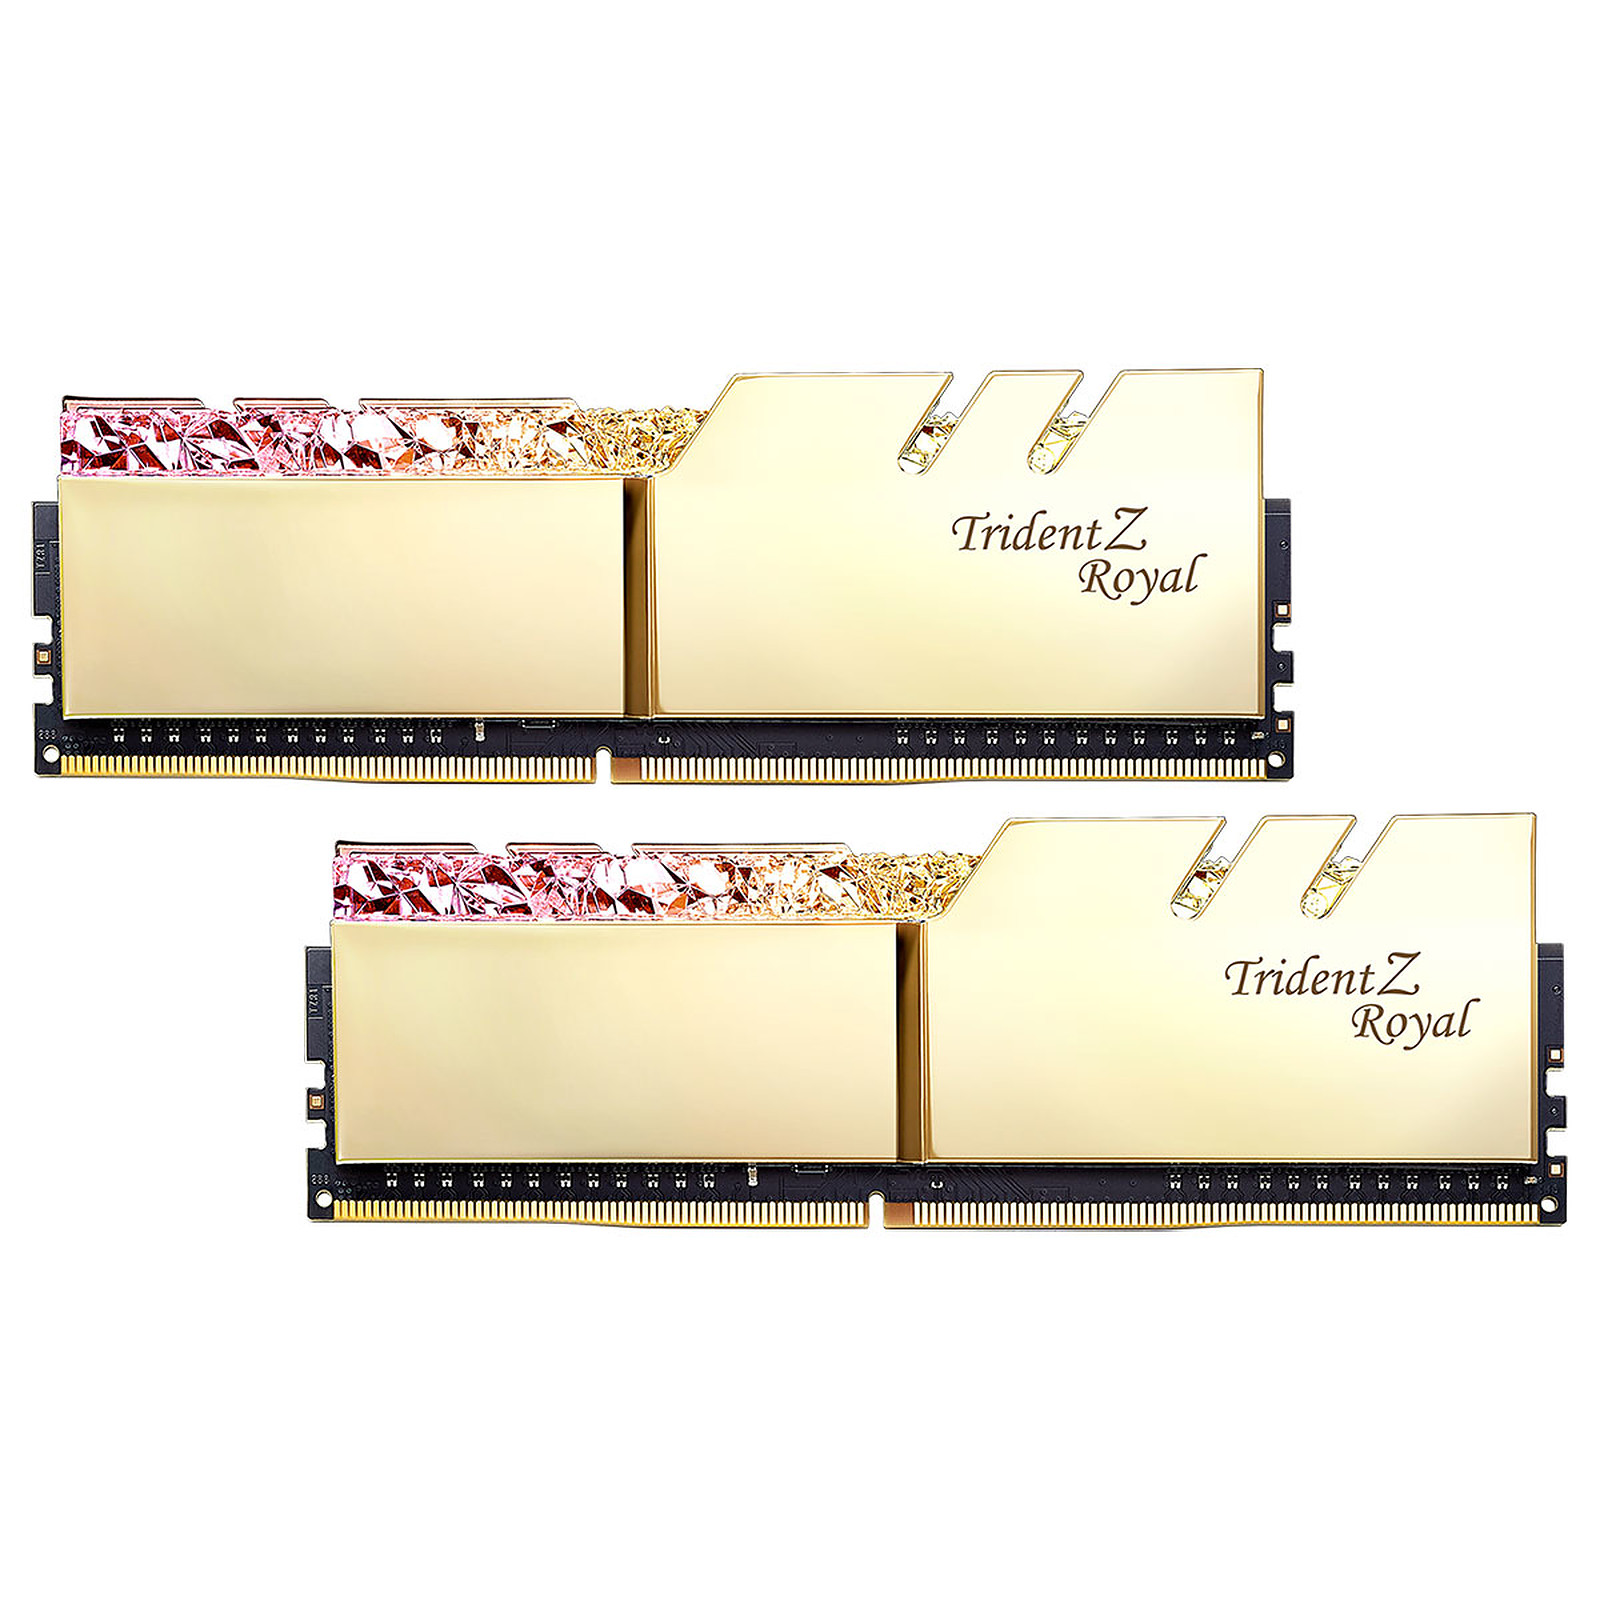 G.Skill Trident Z Royal 16 Go (2x 8 Go) DDR4 4600 MHz CL18 - Or